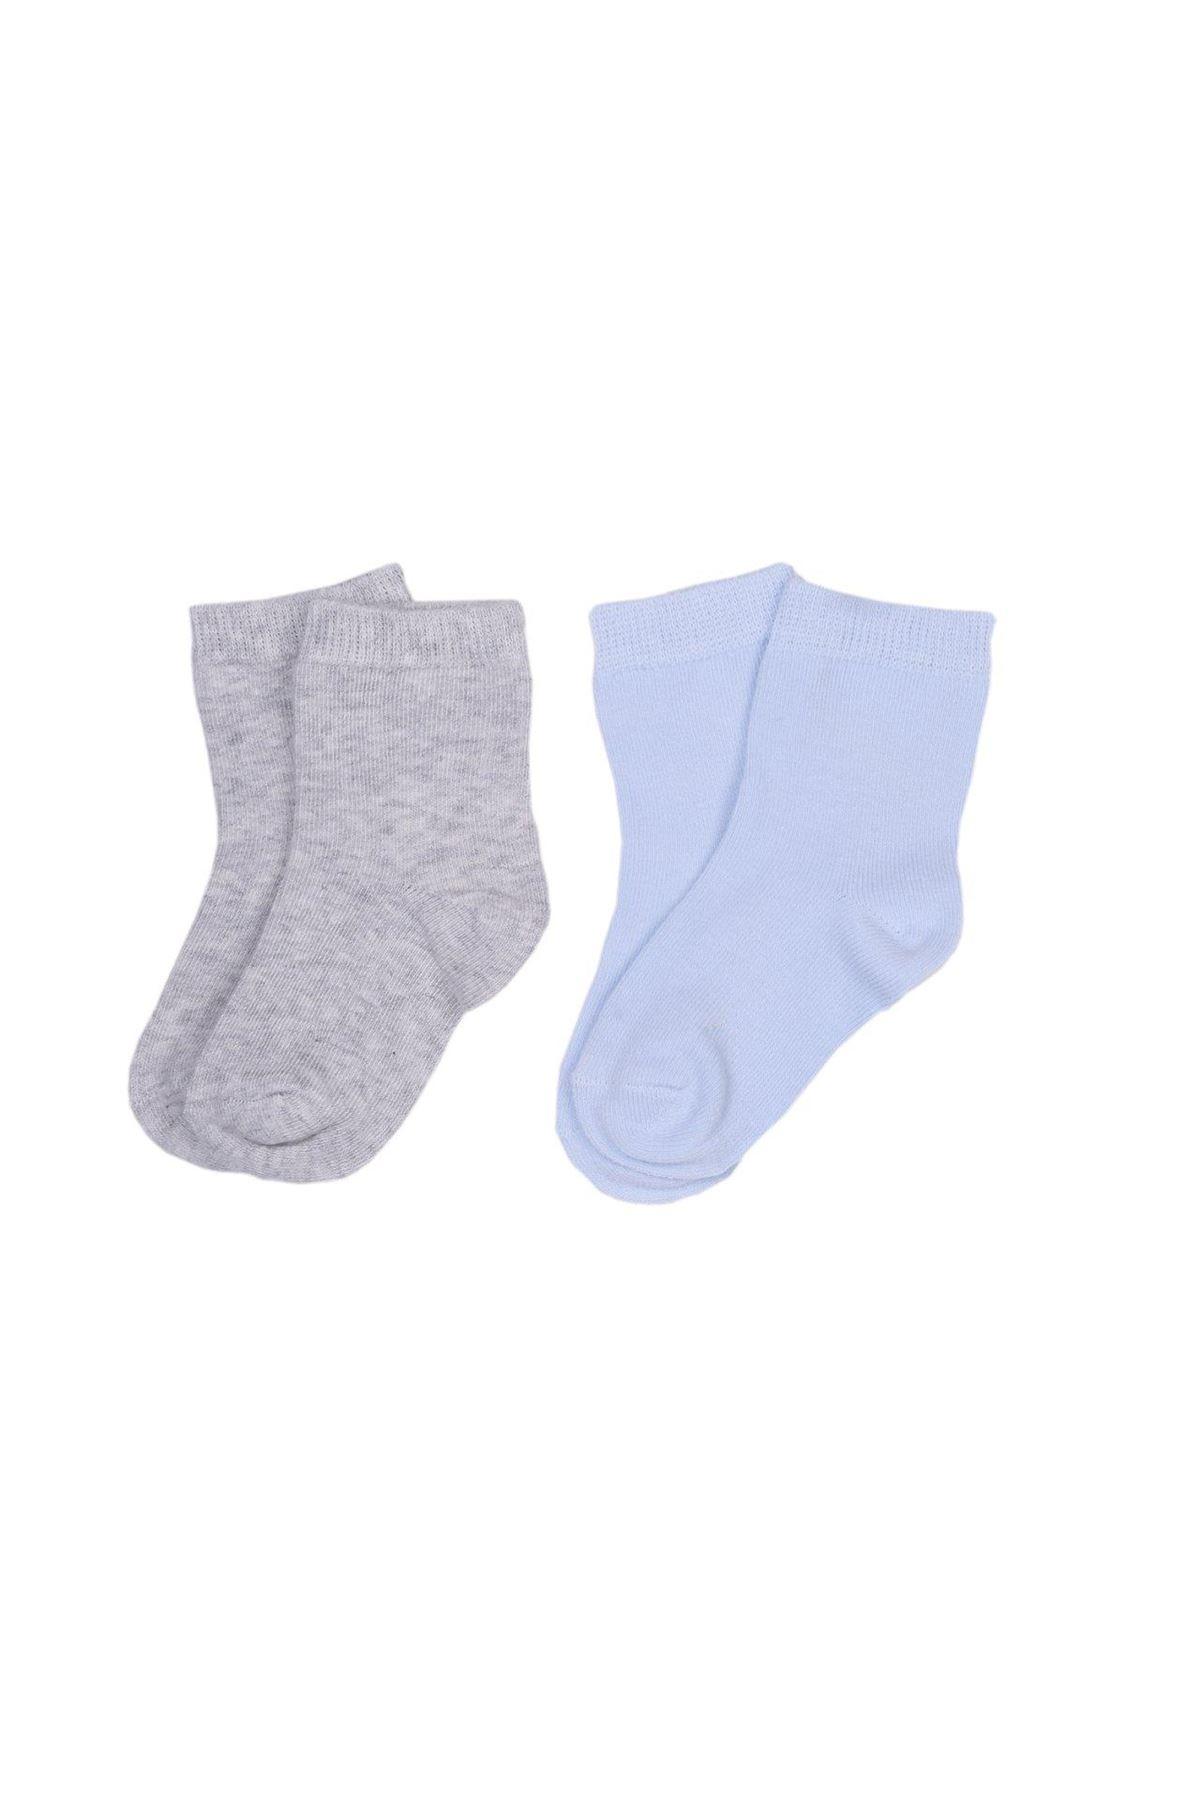 KitiKate Organik 2li Çorap 52060 Gri